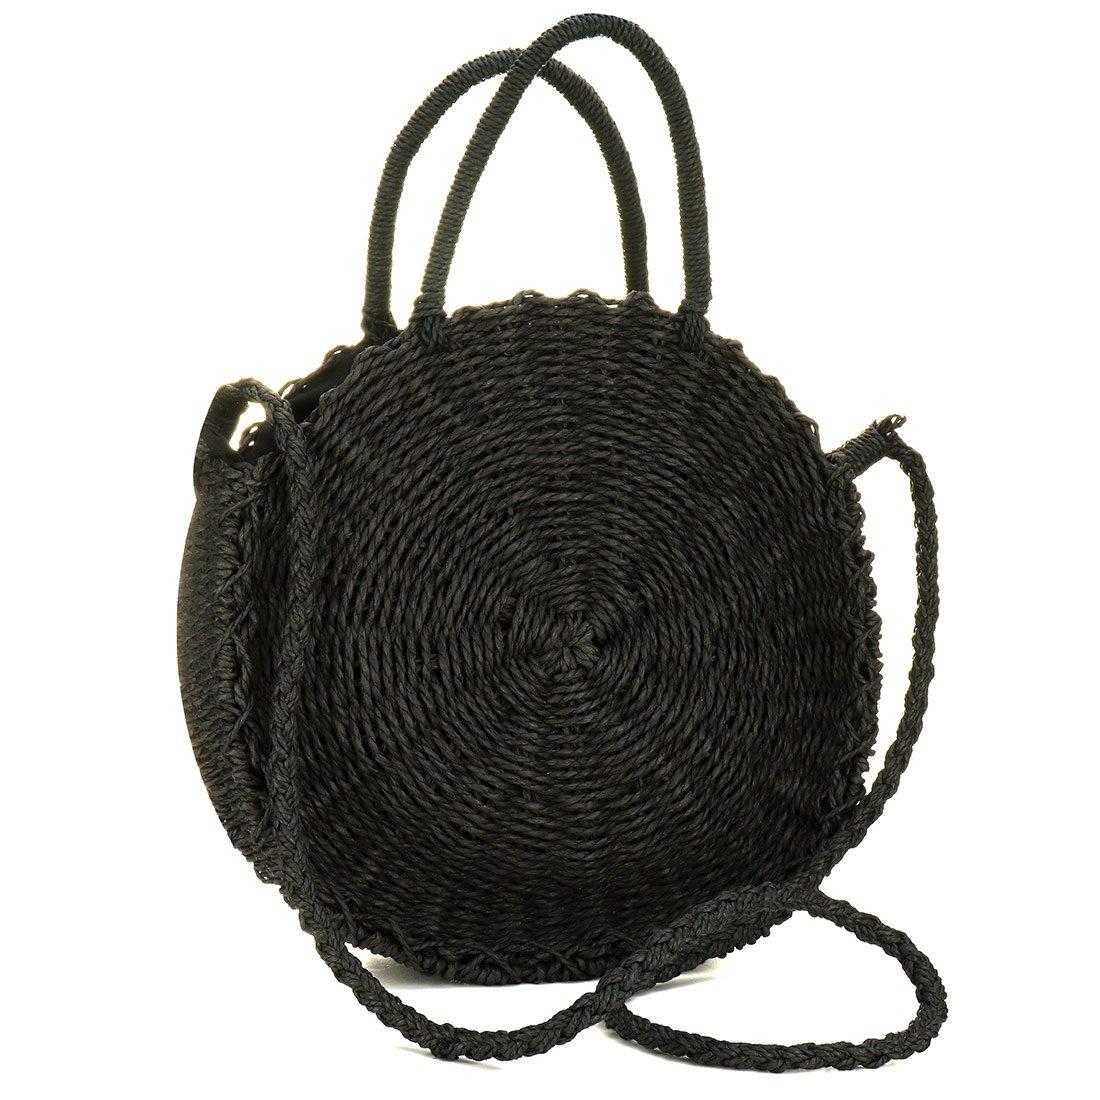 EROGE Straw Crossbody Bag Women Weave Shoulder Bag Round Summer Beach Purse Handbags (Black)